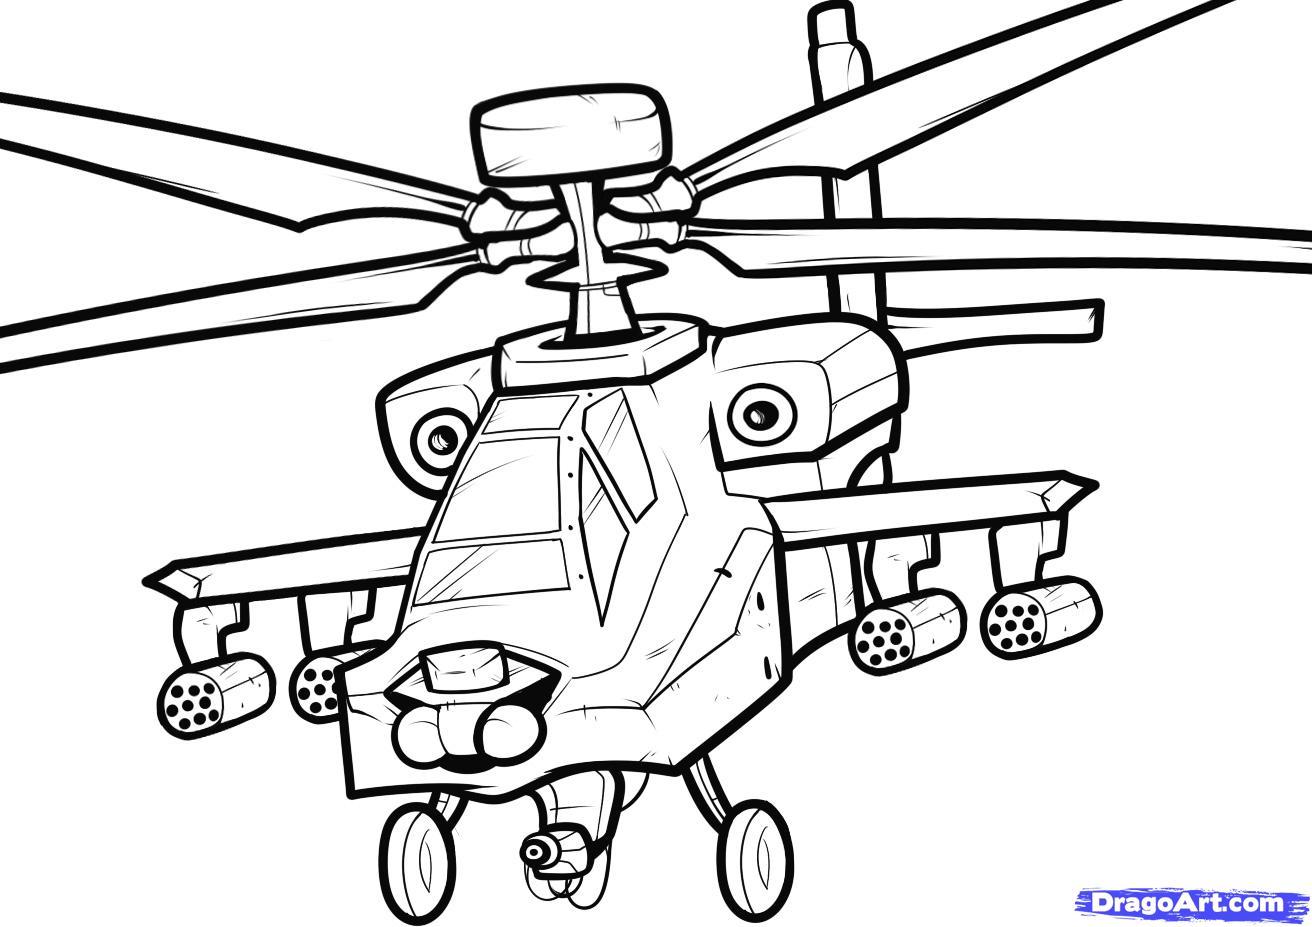 Рисуем вертолет AH-64 Apache - шаг 9